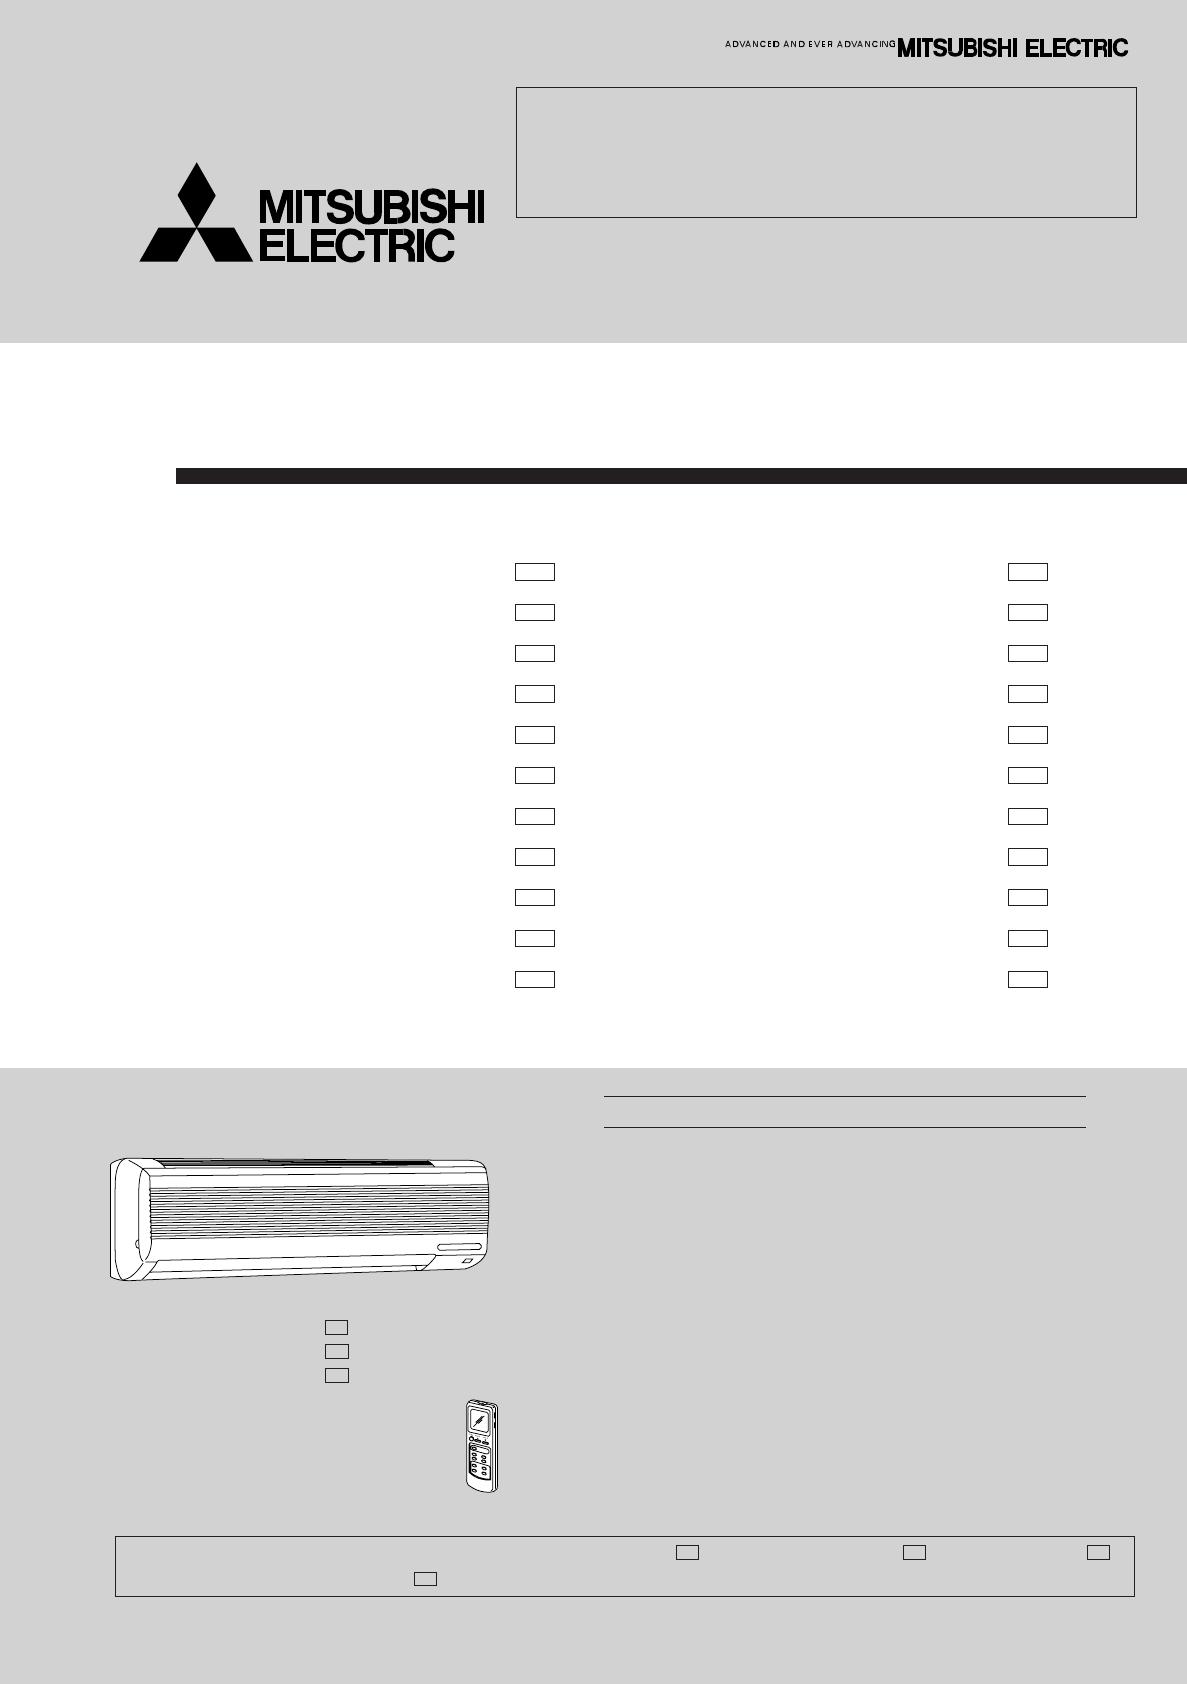 hight resolution of mitsubishi electronics service manual